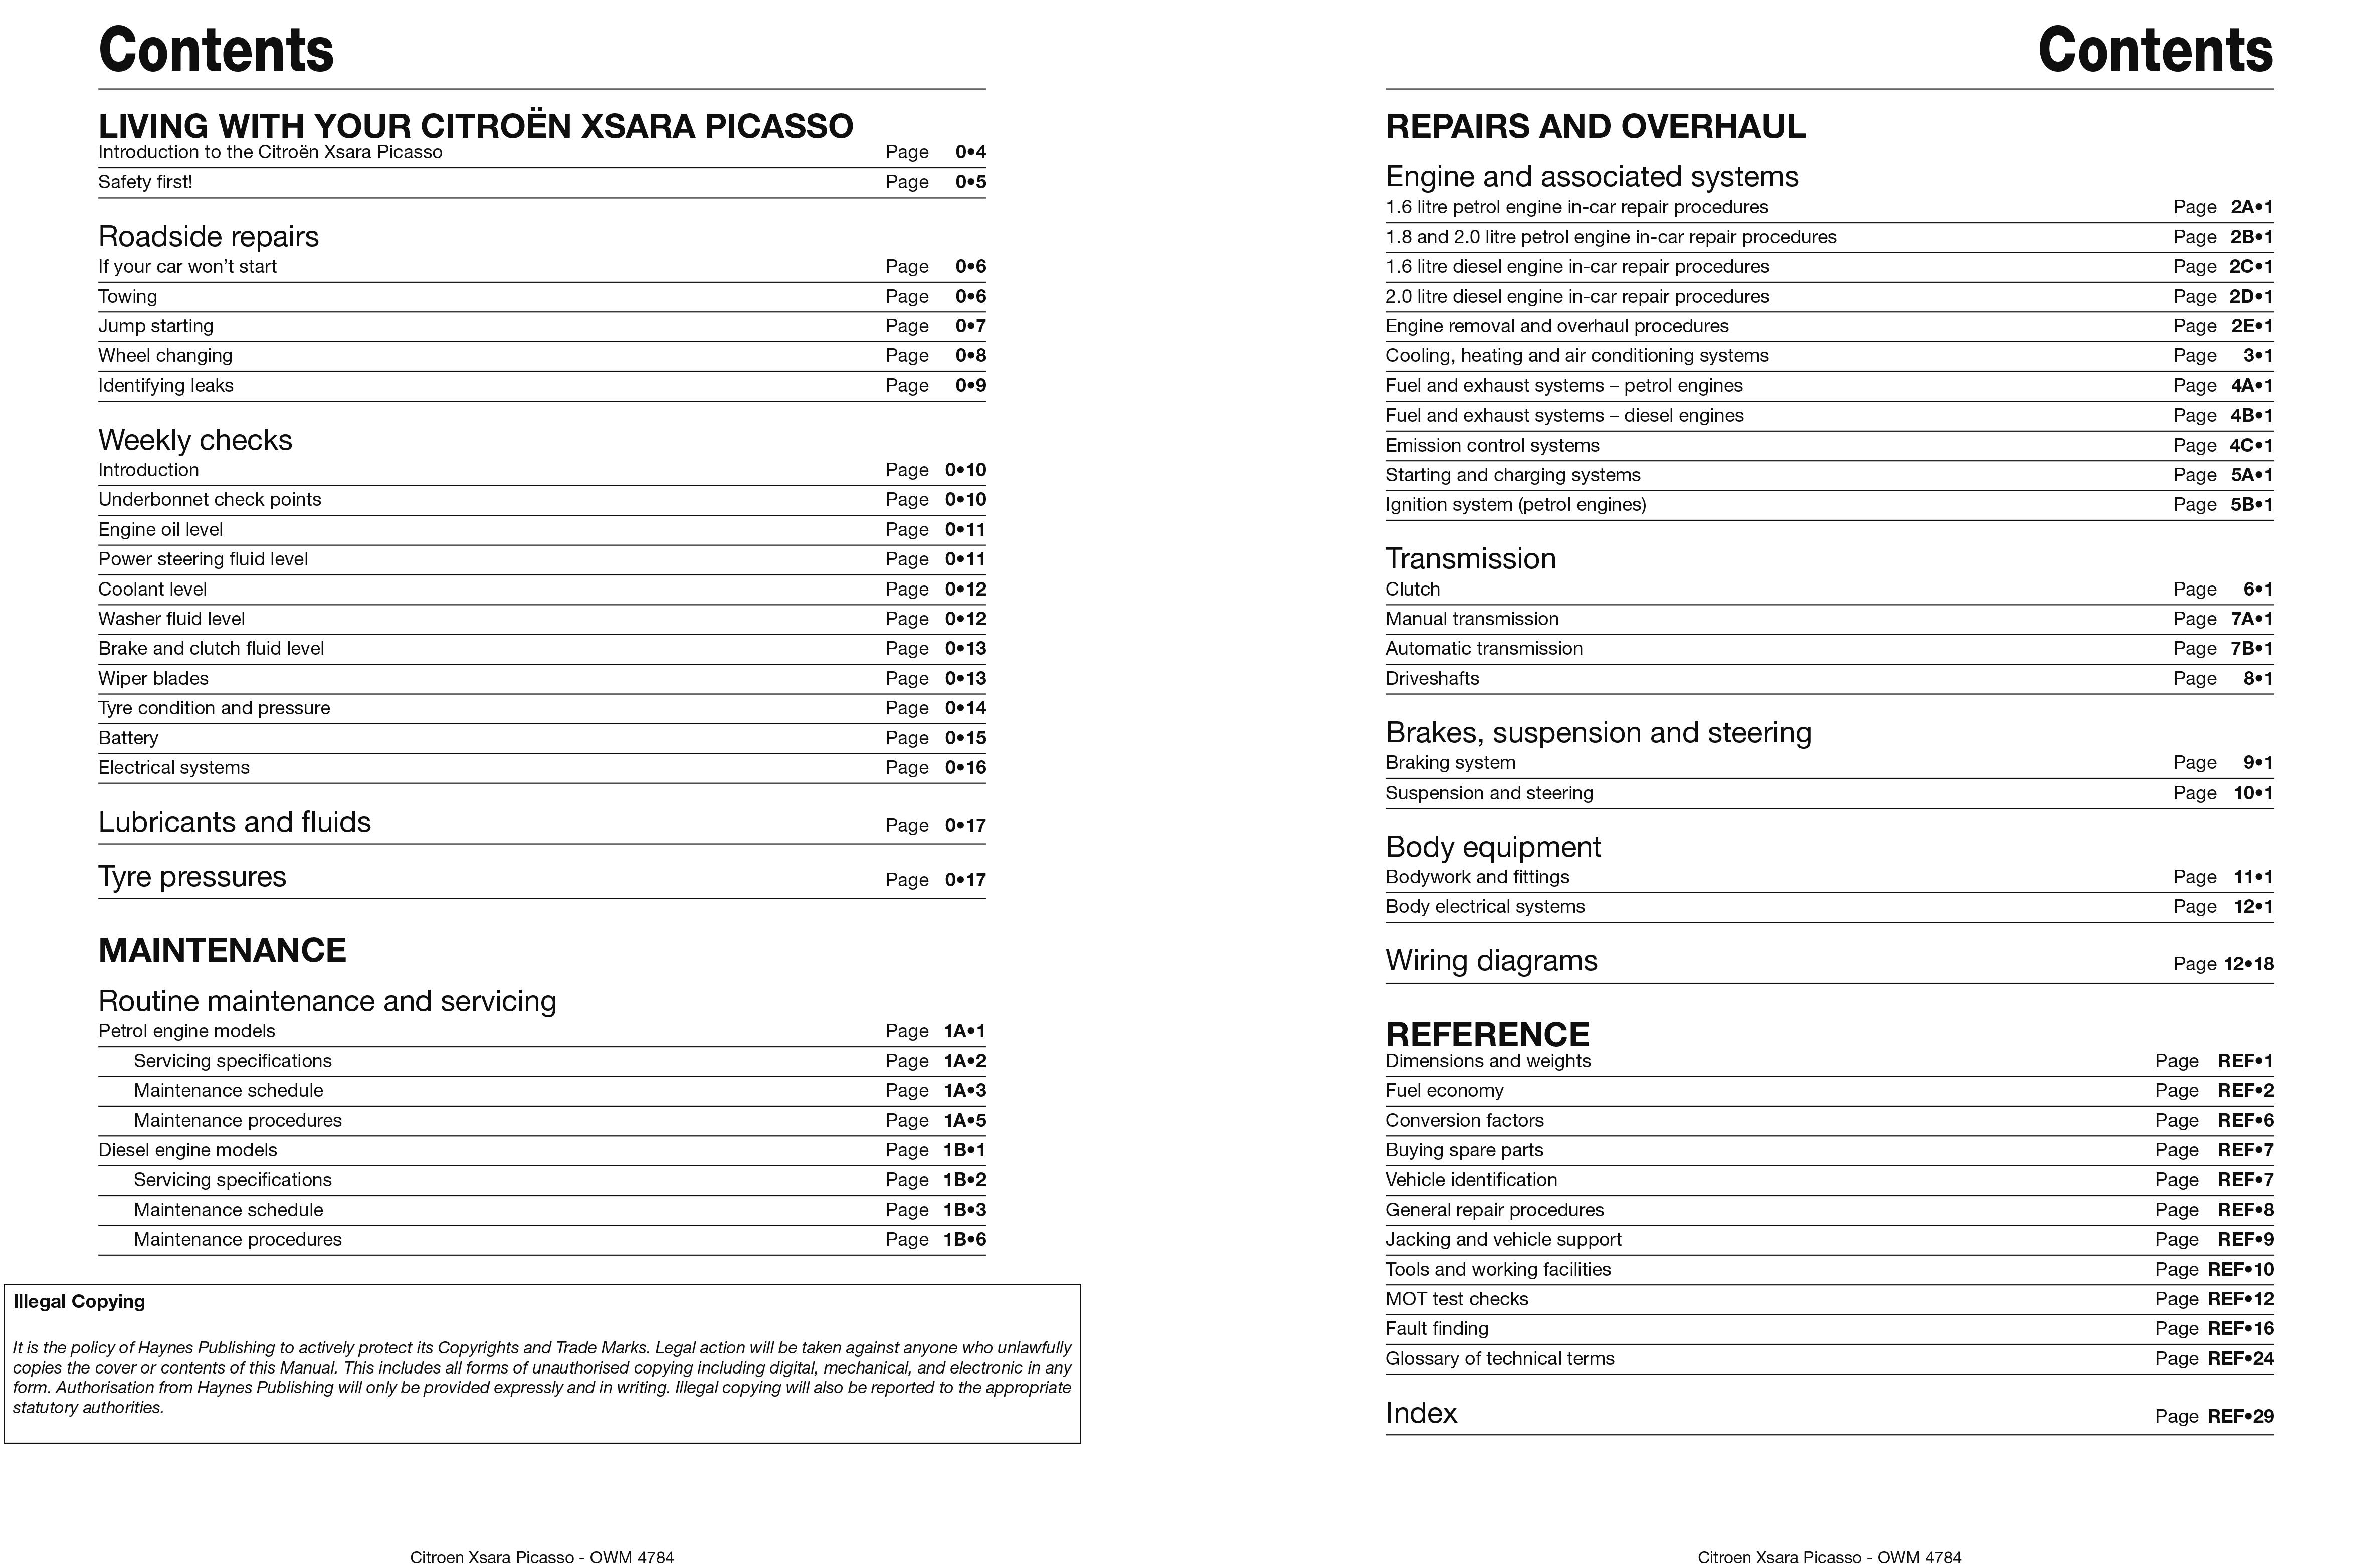 Xsara Picasso Haynes Publishing Citroen Saxo 16 Wiring Diagrams Manuals Online Scroll Right